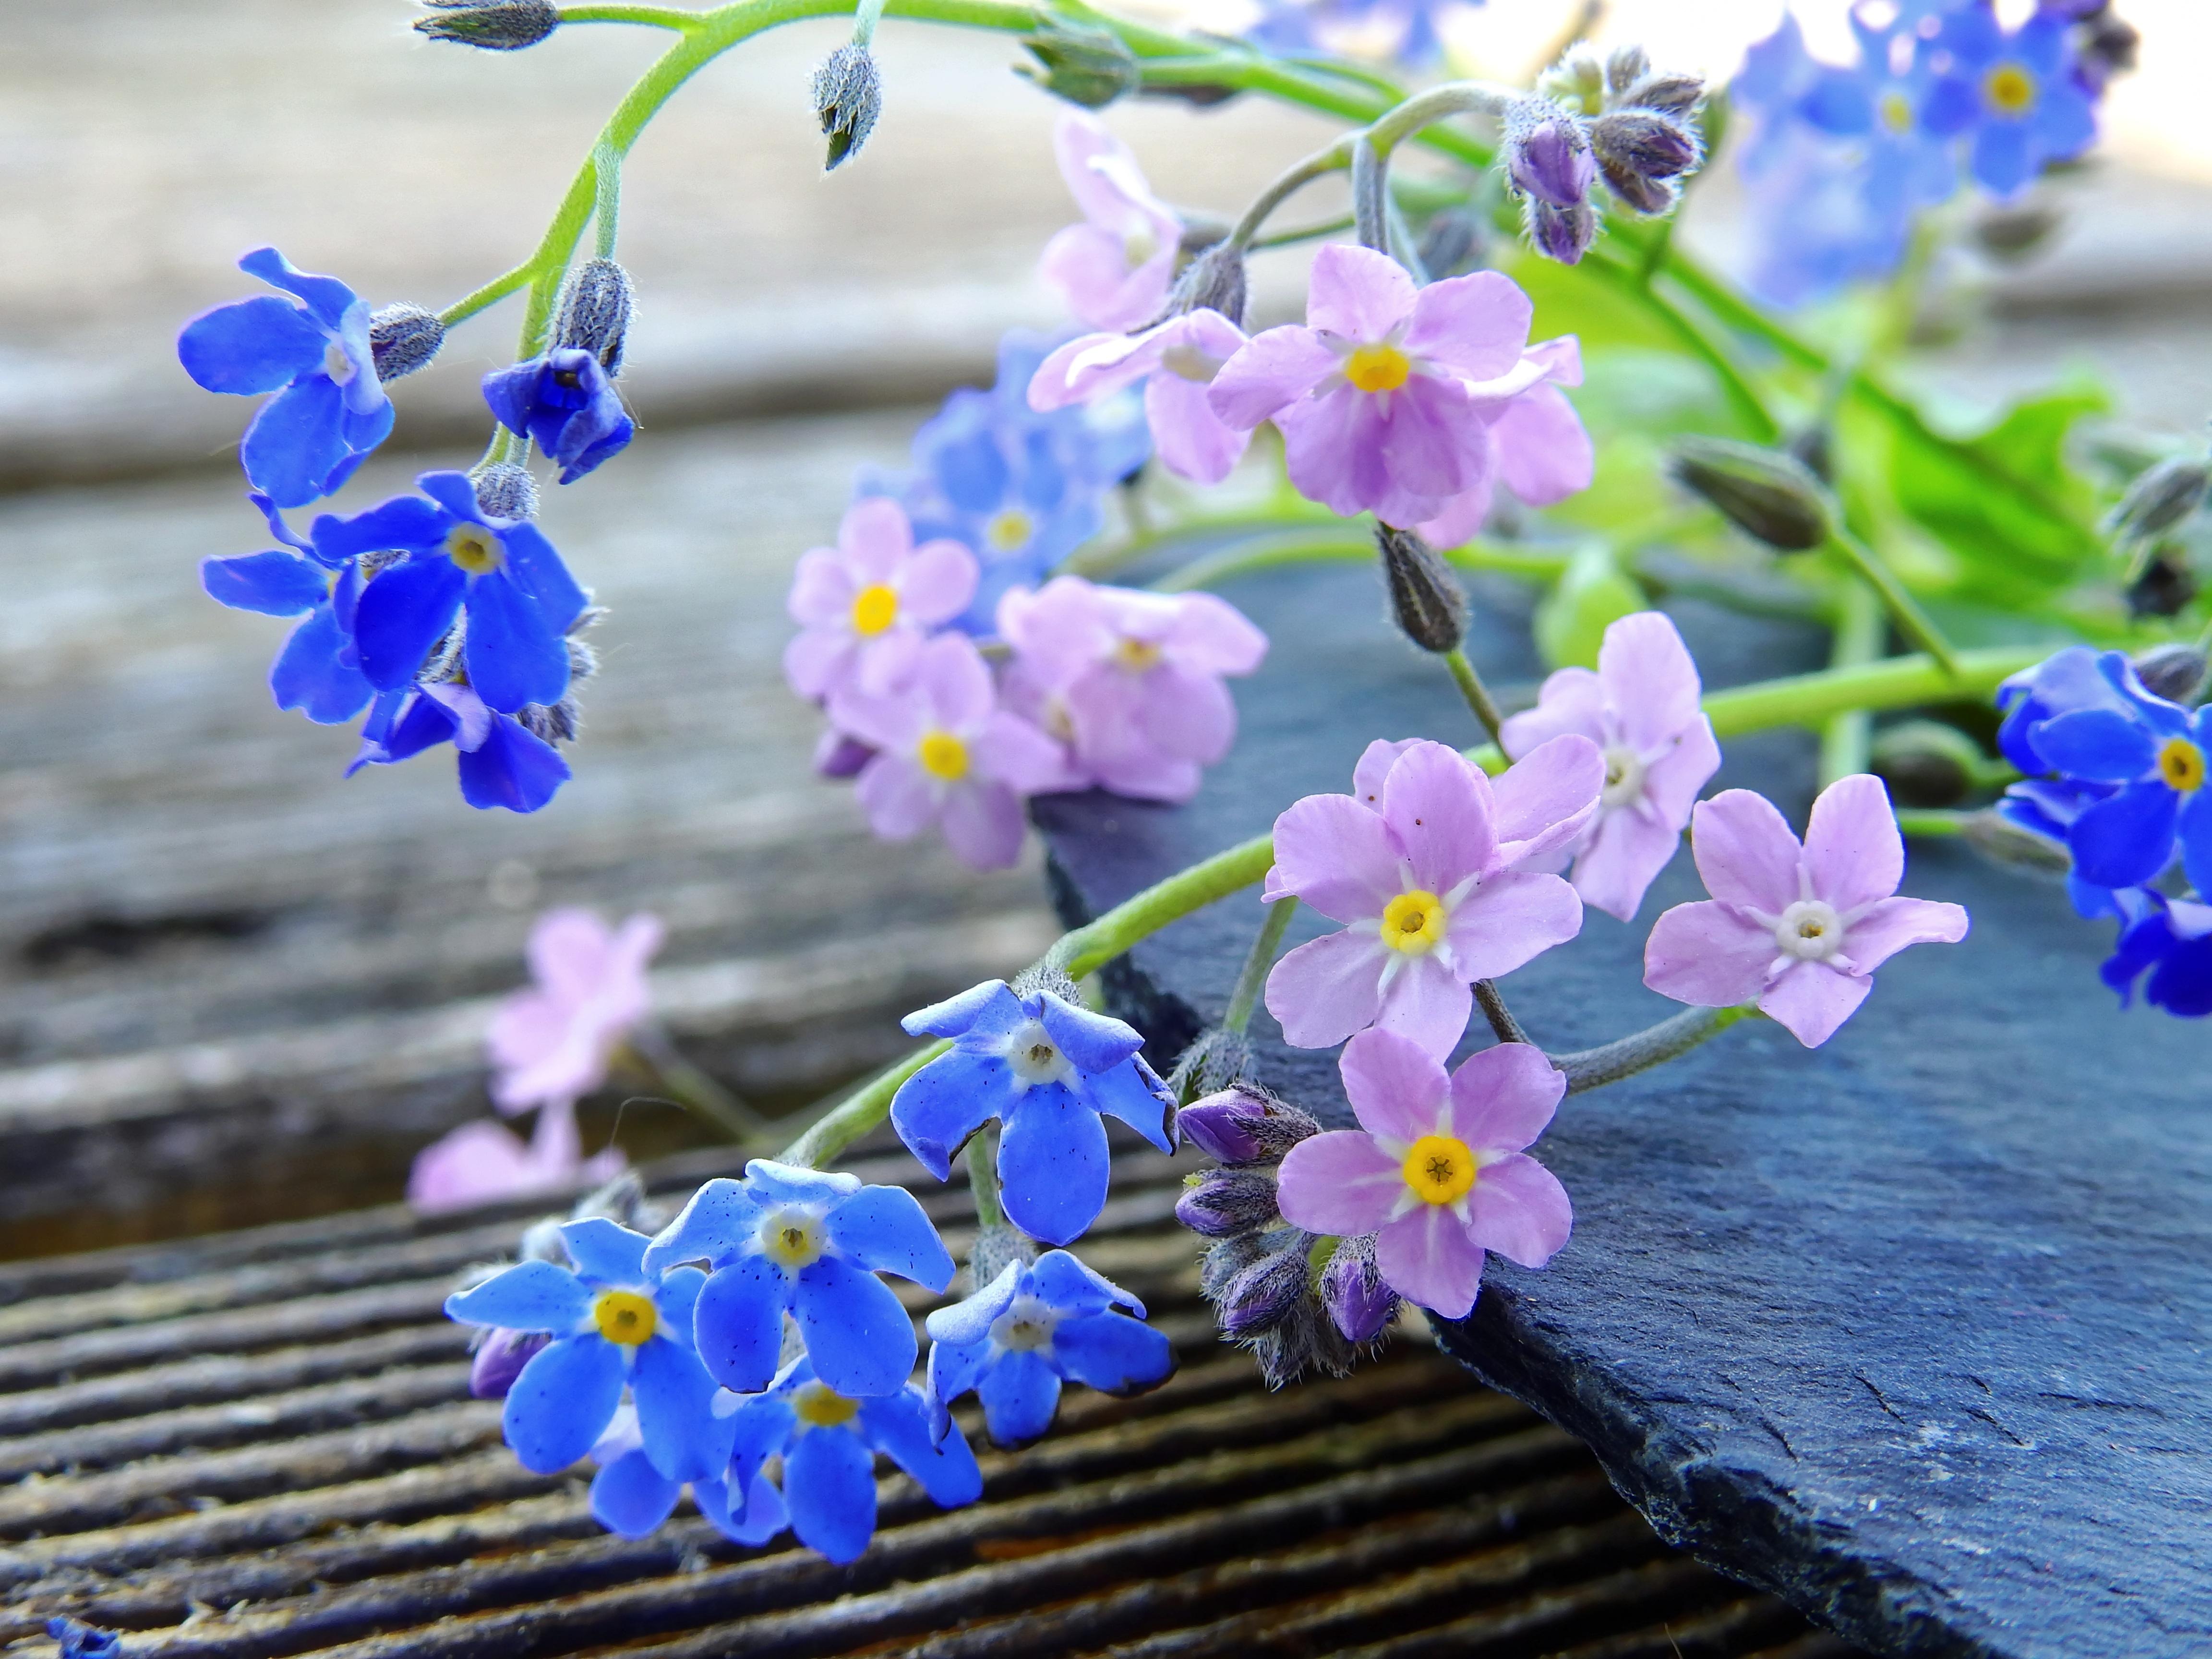 Free Images Blossom Petal Bloom Blue Pink Flora Wildflower